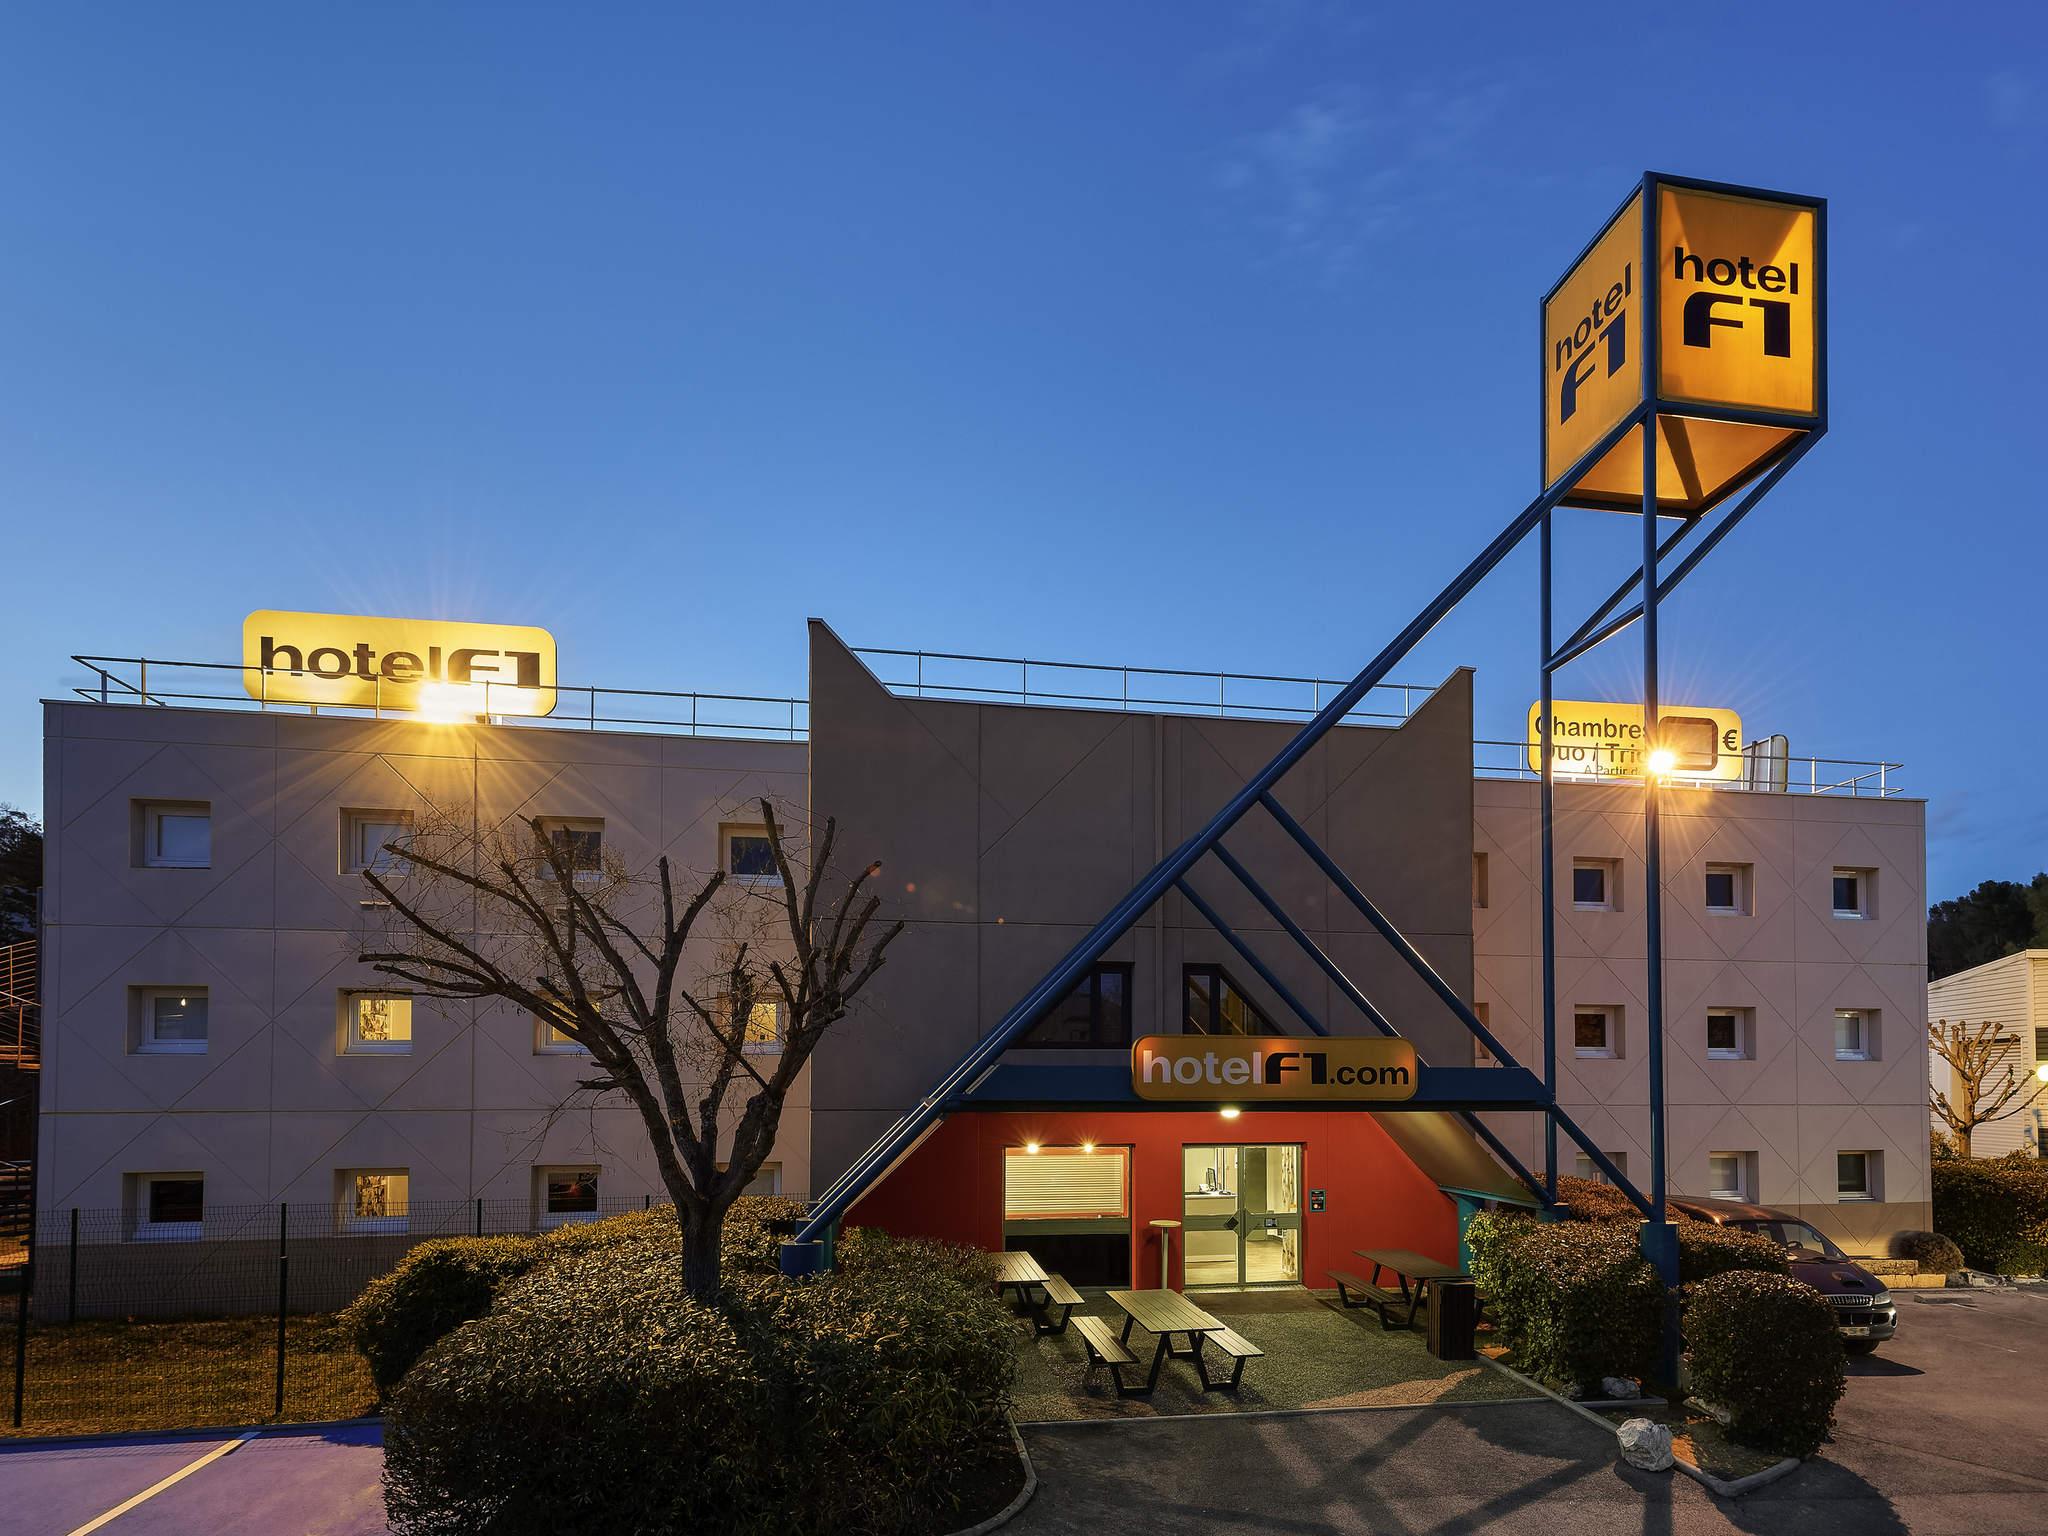 ホテル – hotelF1 Marseille La Valentine (rénové)